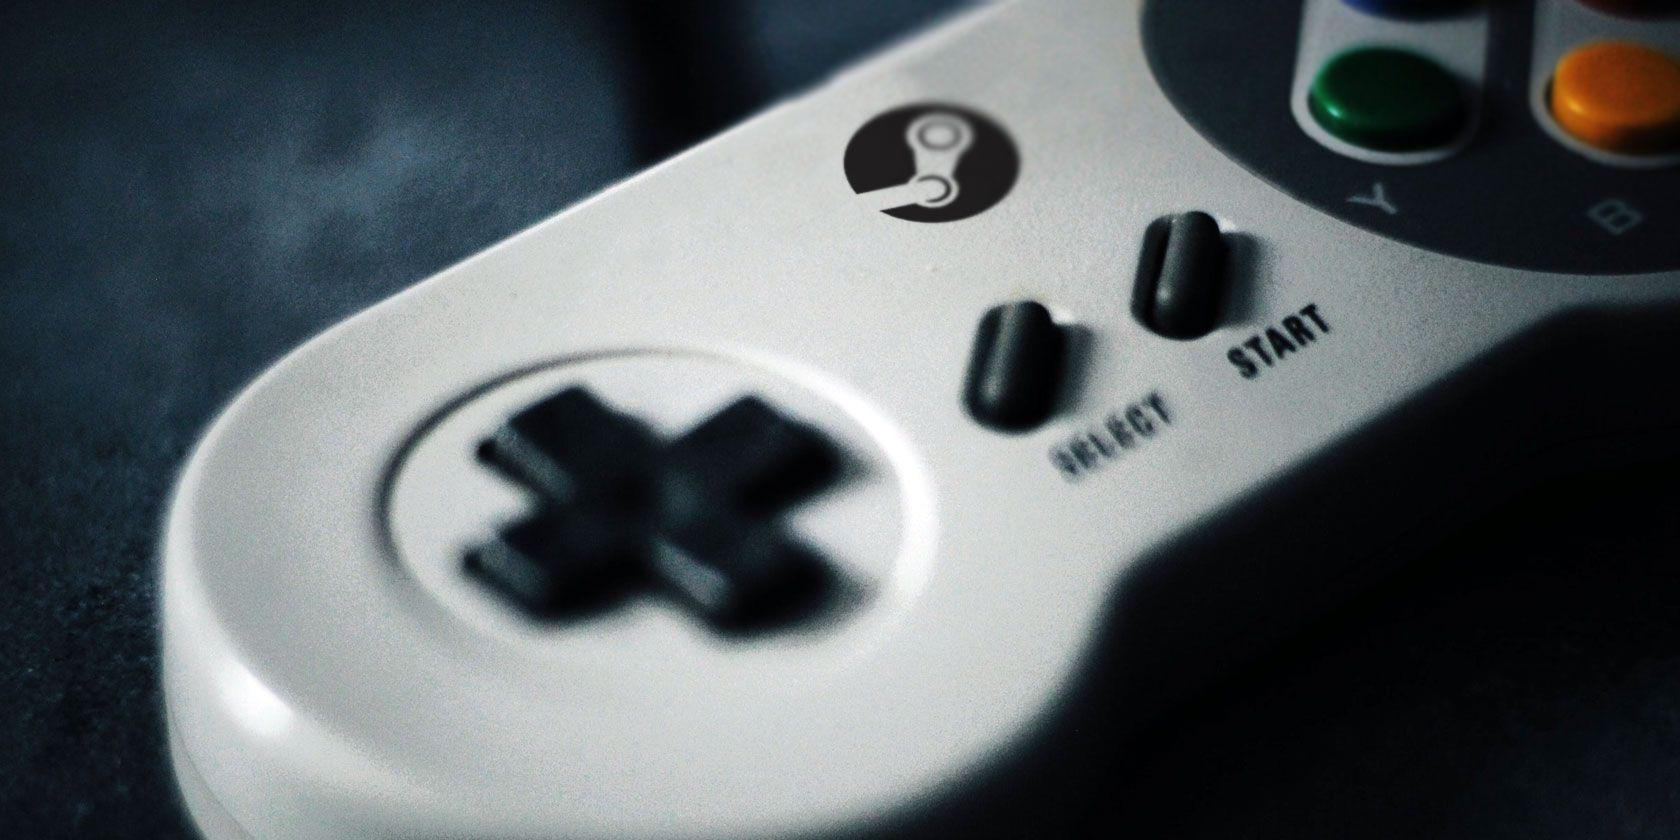 retro-gaming-steam-link